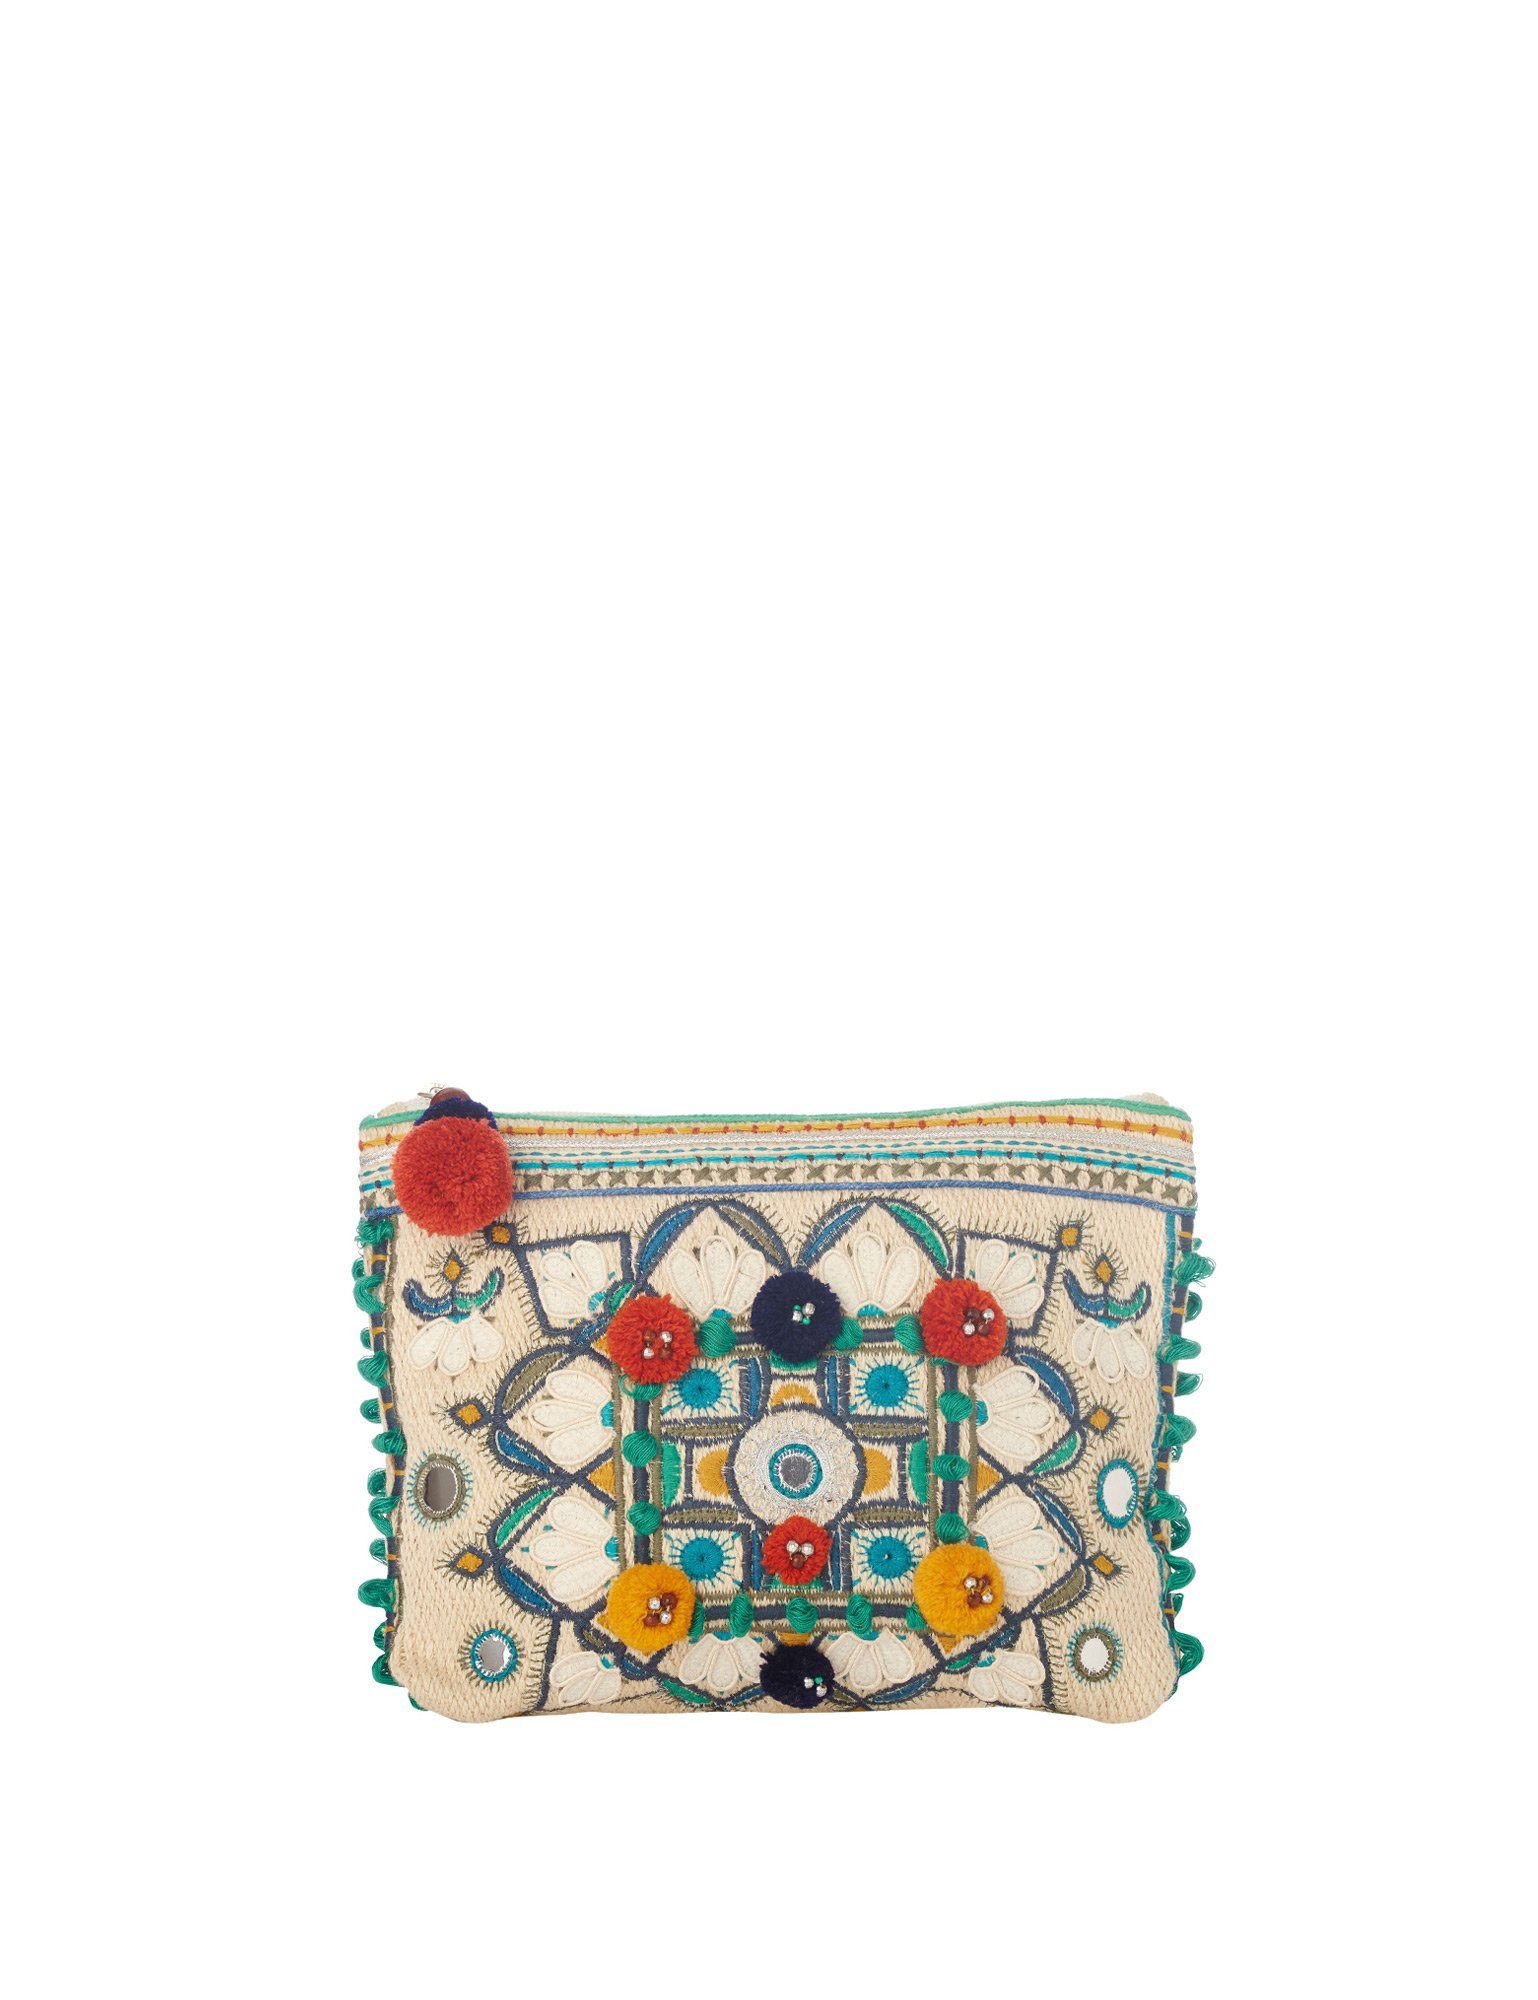 Star Mela Women's Manali Women's Ecru-Multicolor Purse 100% Cotton